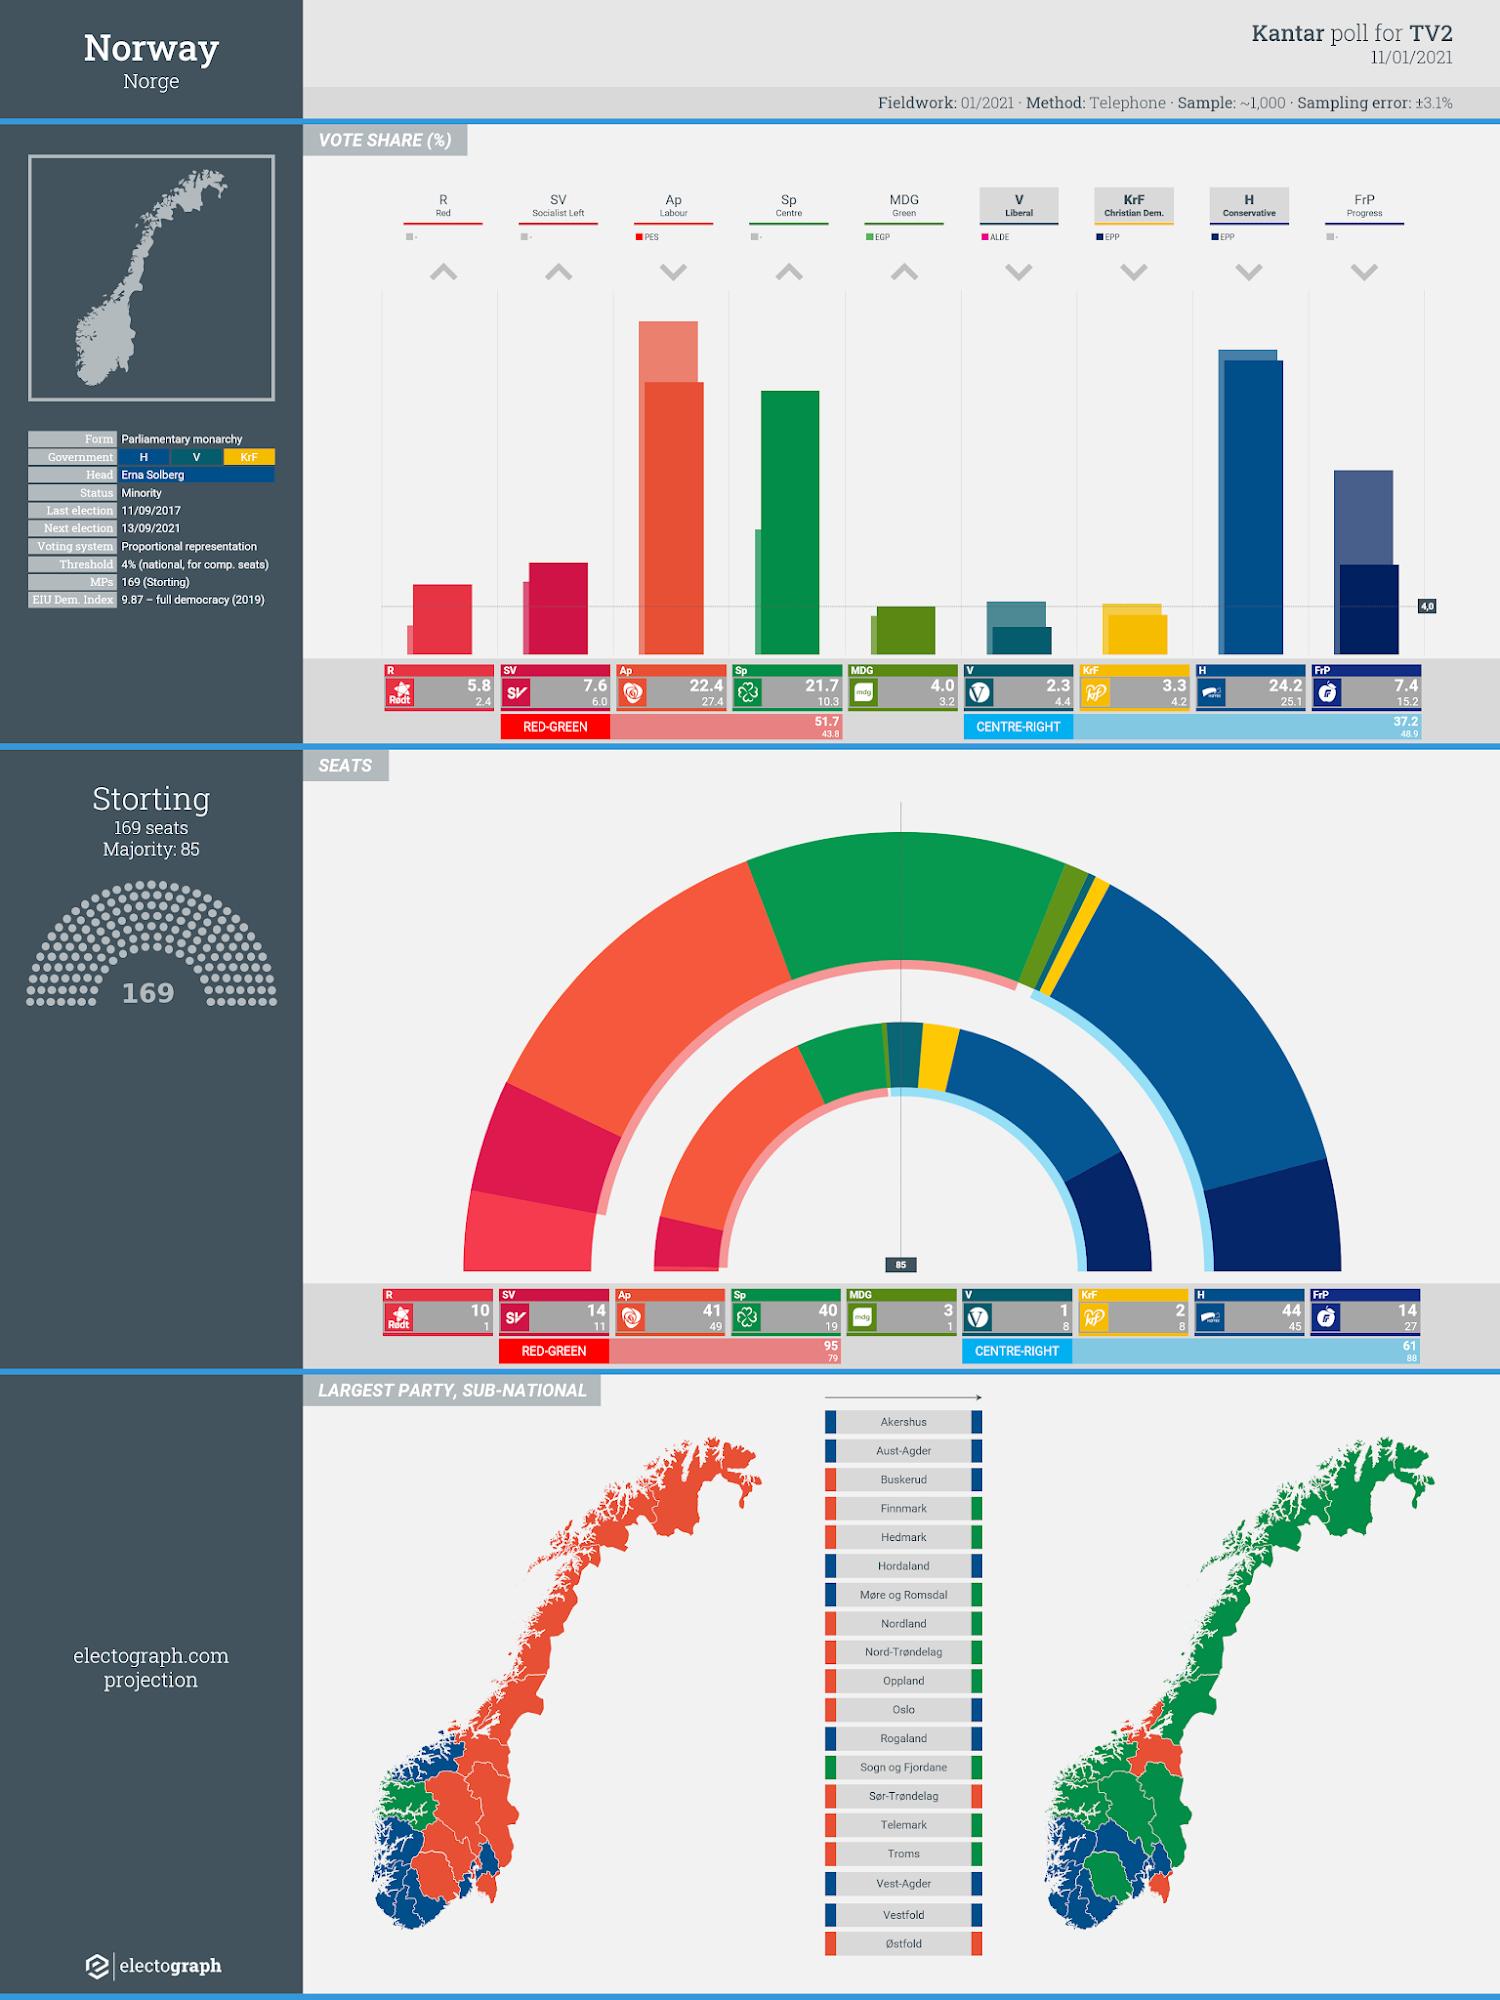 NORWAY: Kantar poll chart for TV2, 11 January 2021